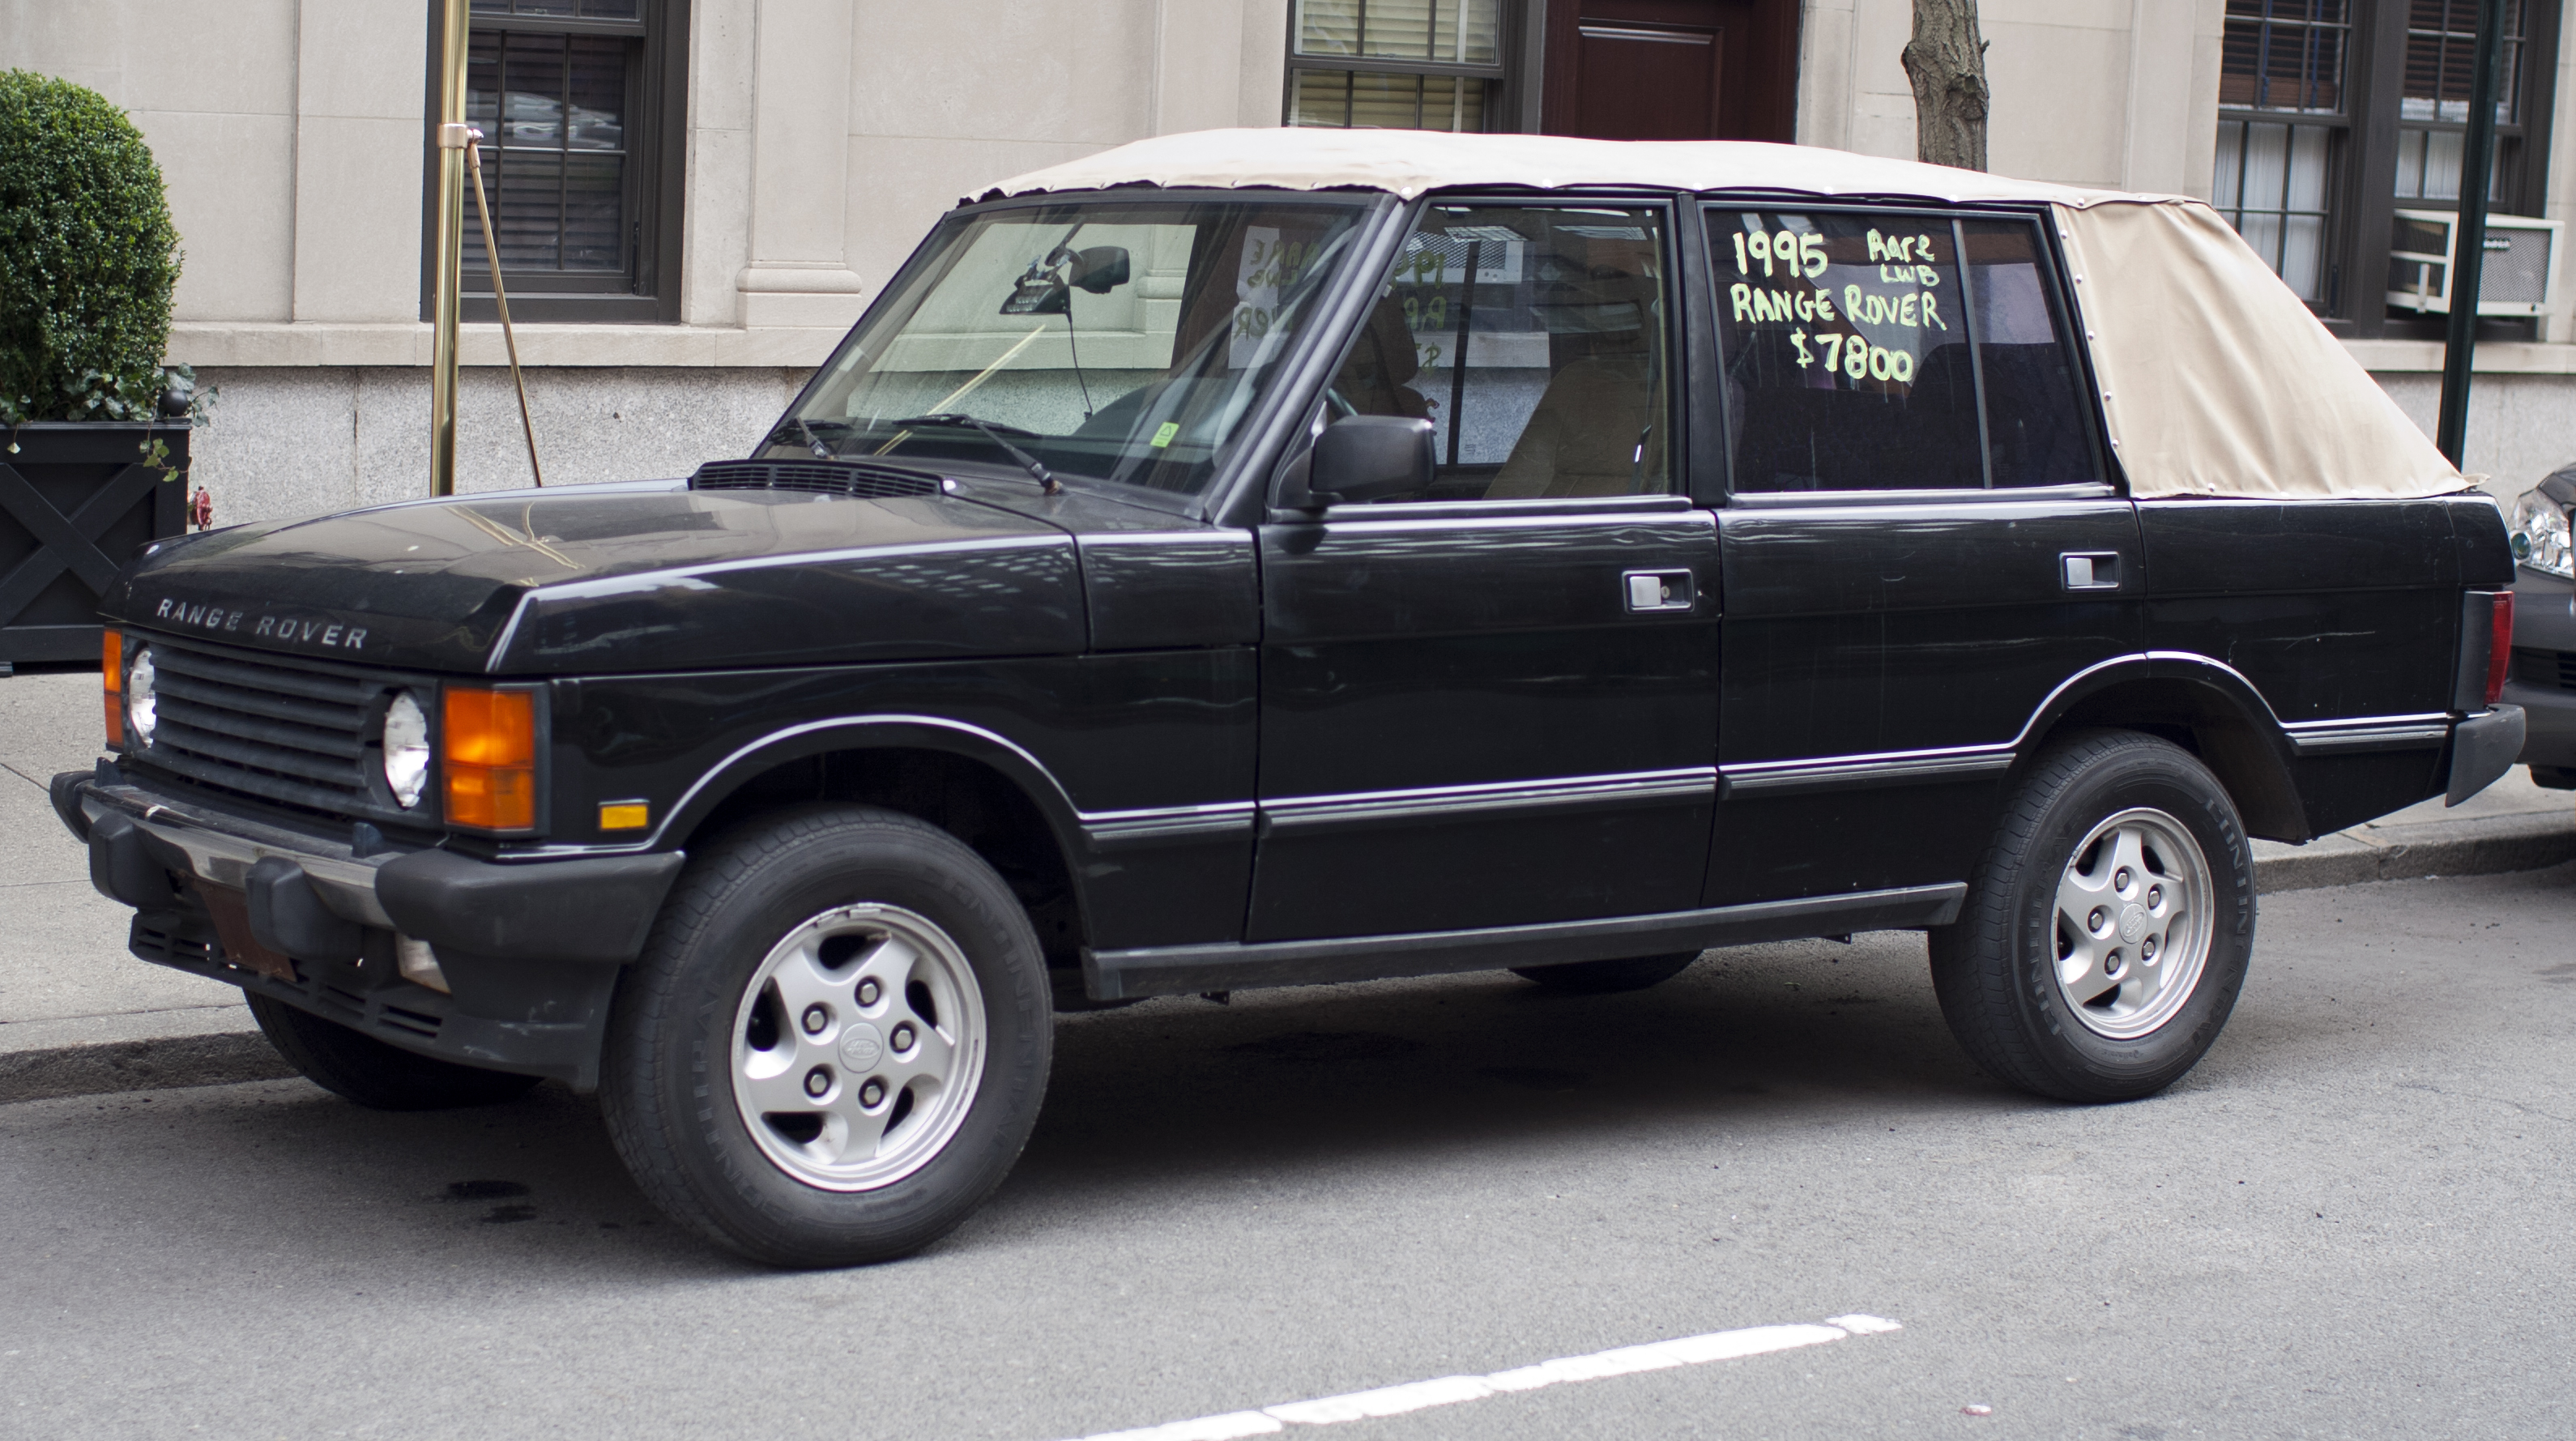 1995_Range_Rover_County_convertible.jpg